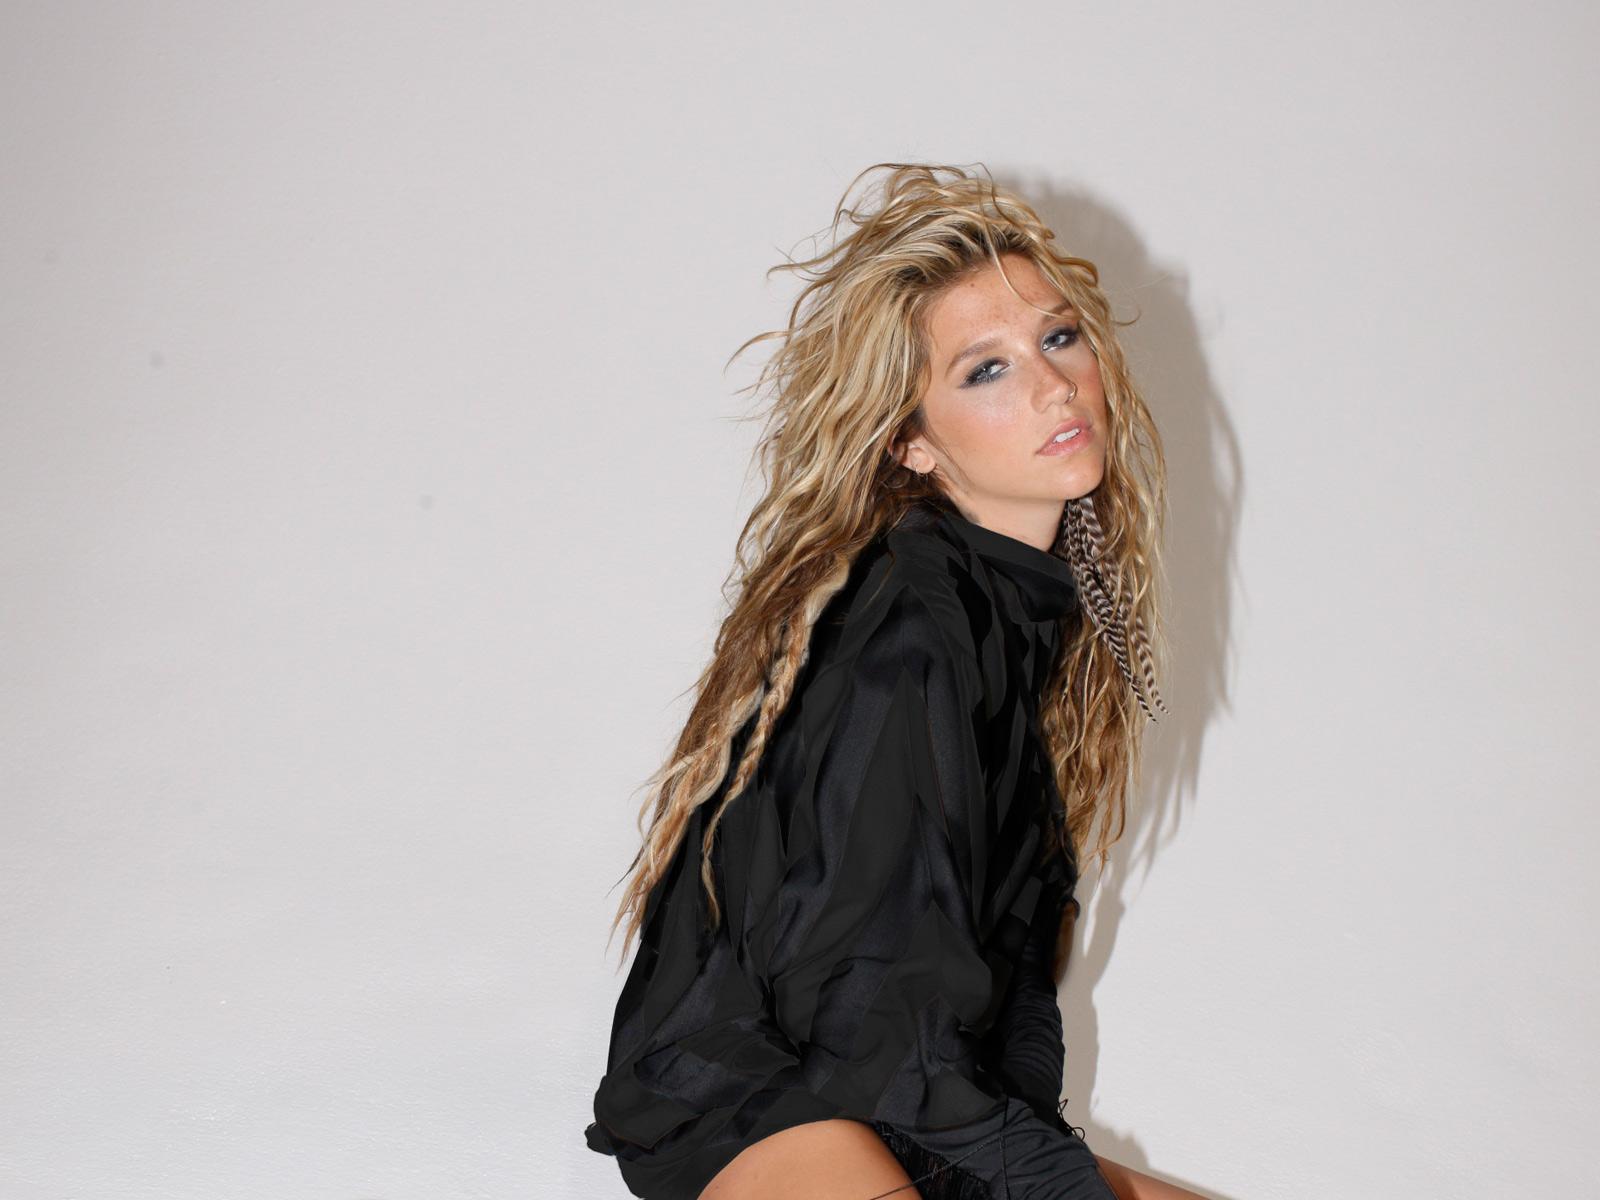 http://3.bp.blogspot.com/-FOWhNQEjWDg/ToYeXnxFPuI/AAAAAAAAB8w/27xavmP5K7w/s1600/Kesha_Rose_Sebert.jpg